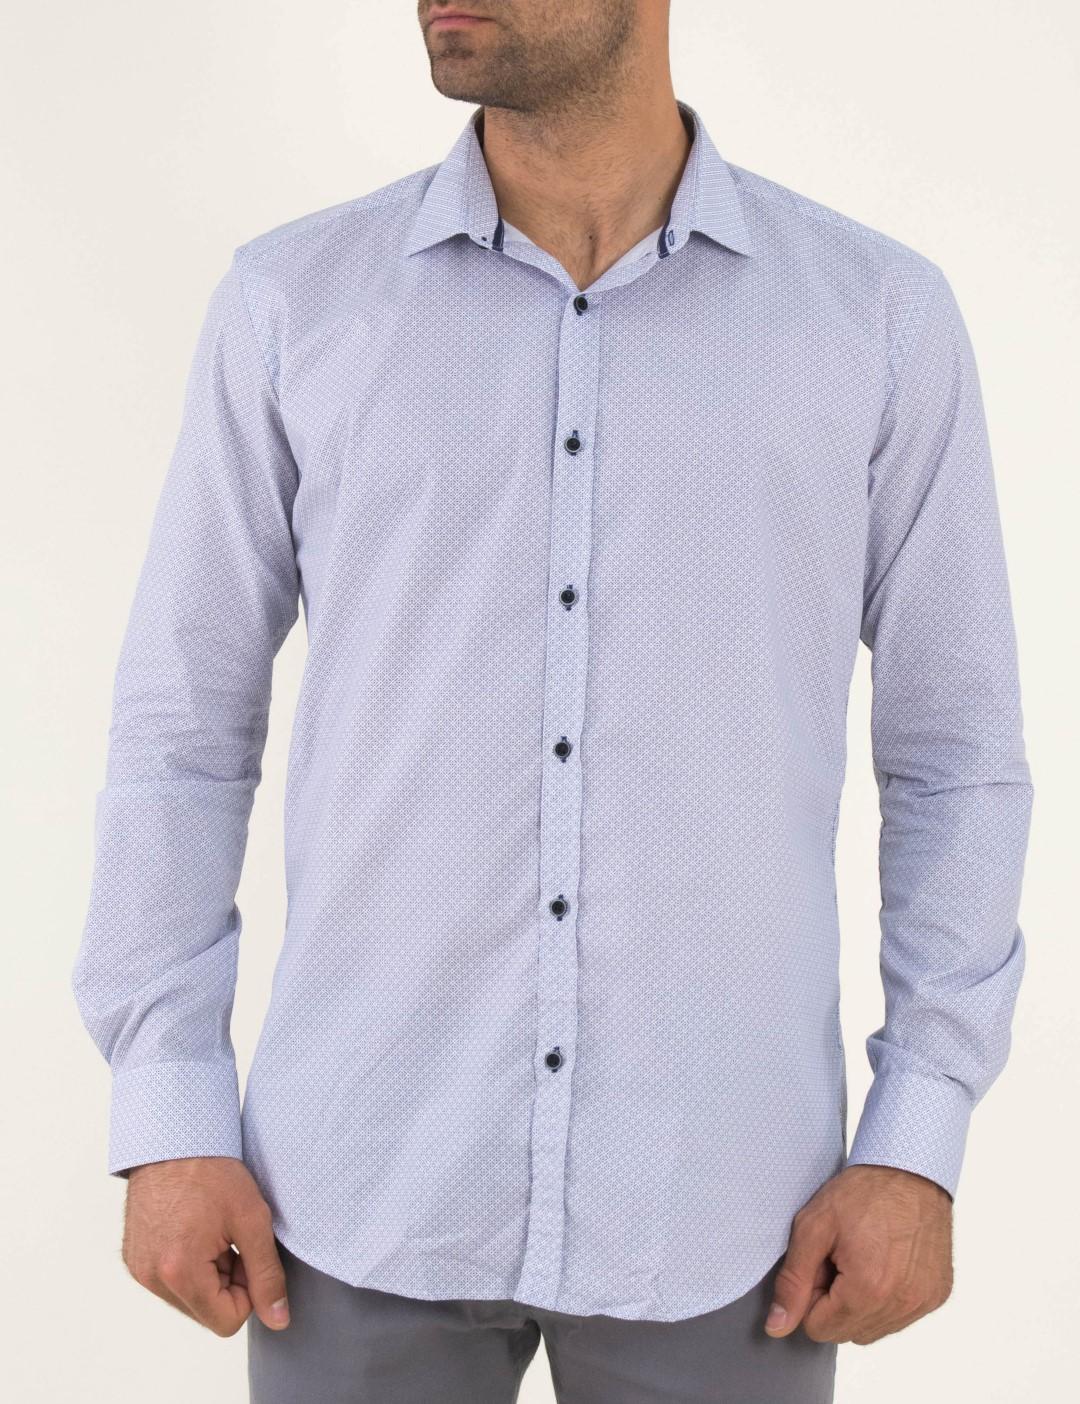 78bd82daef82 Ανδρικό λευκό πουκάμισο μπλε μικροσχέδιο Firenze 0191136